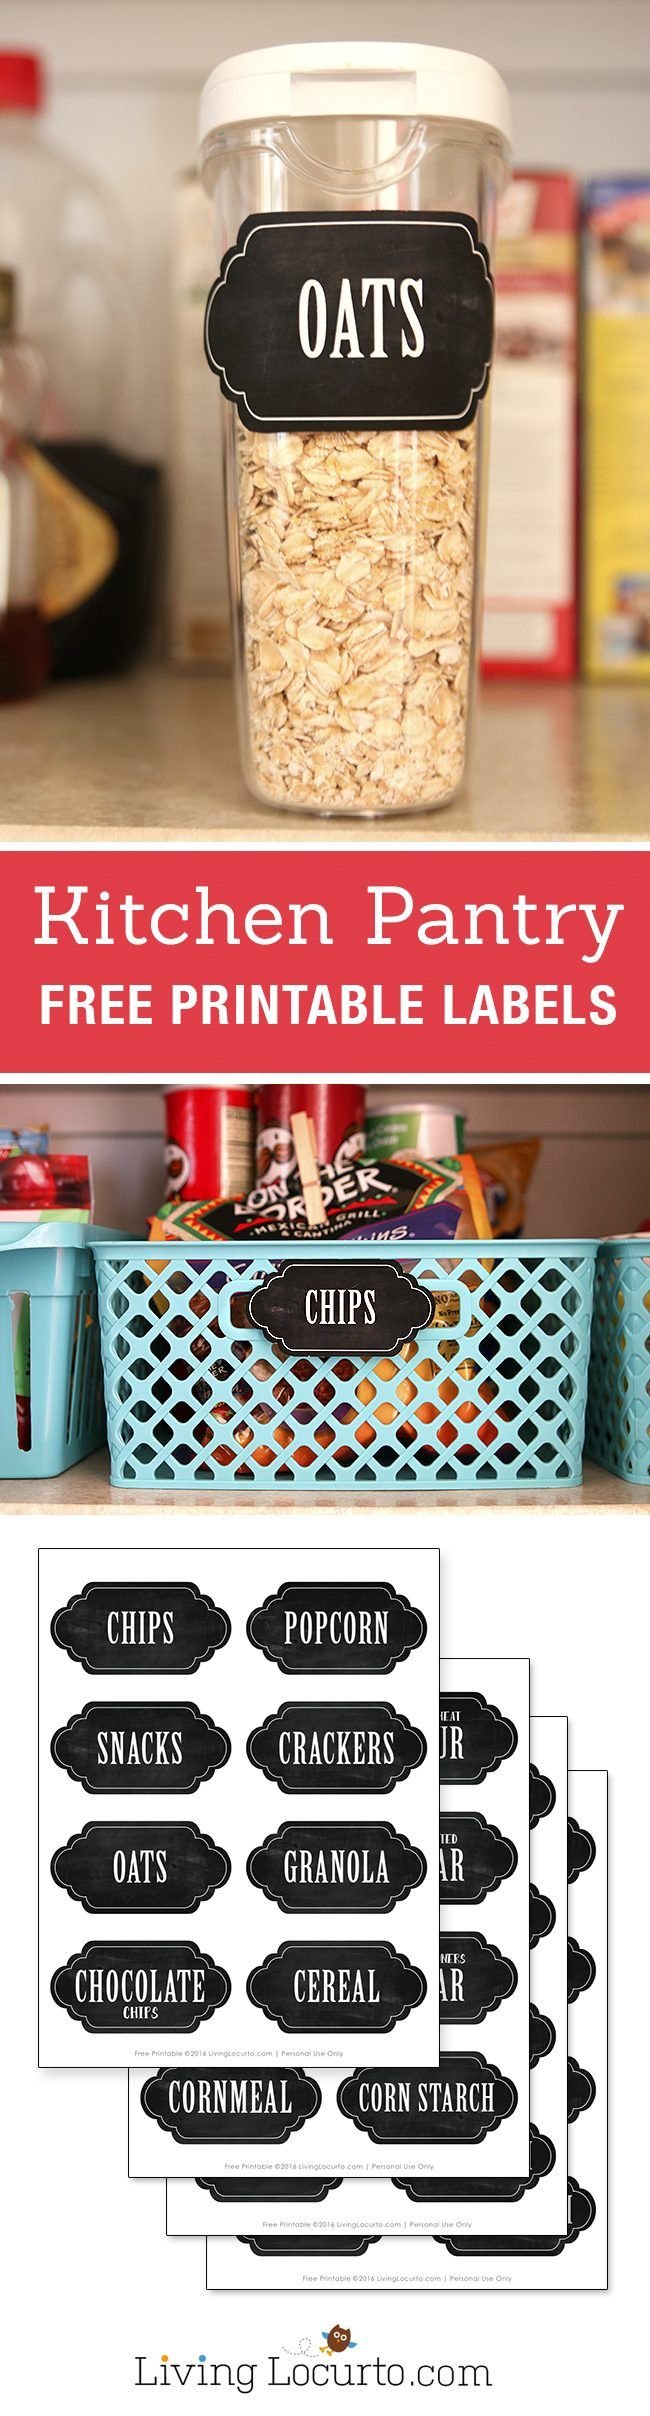 Kitchen Pantry Organization Ideas - Free Printable Labels